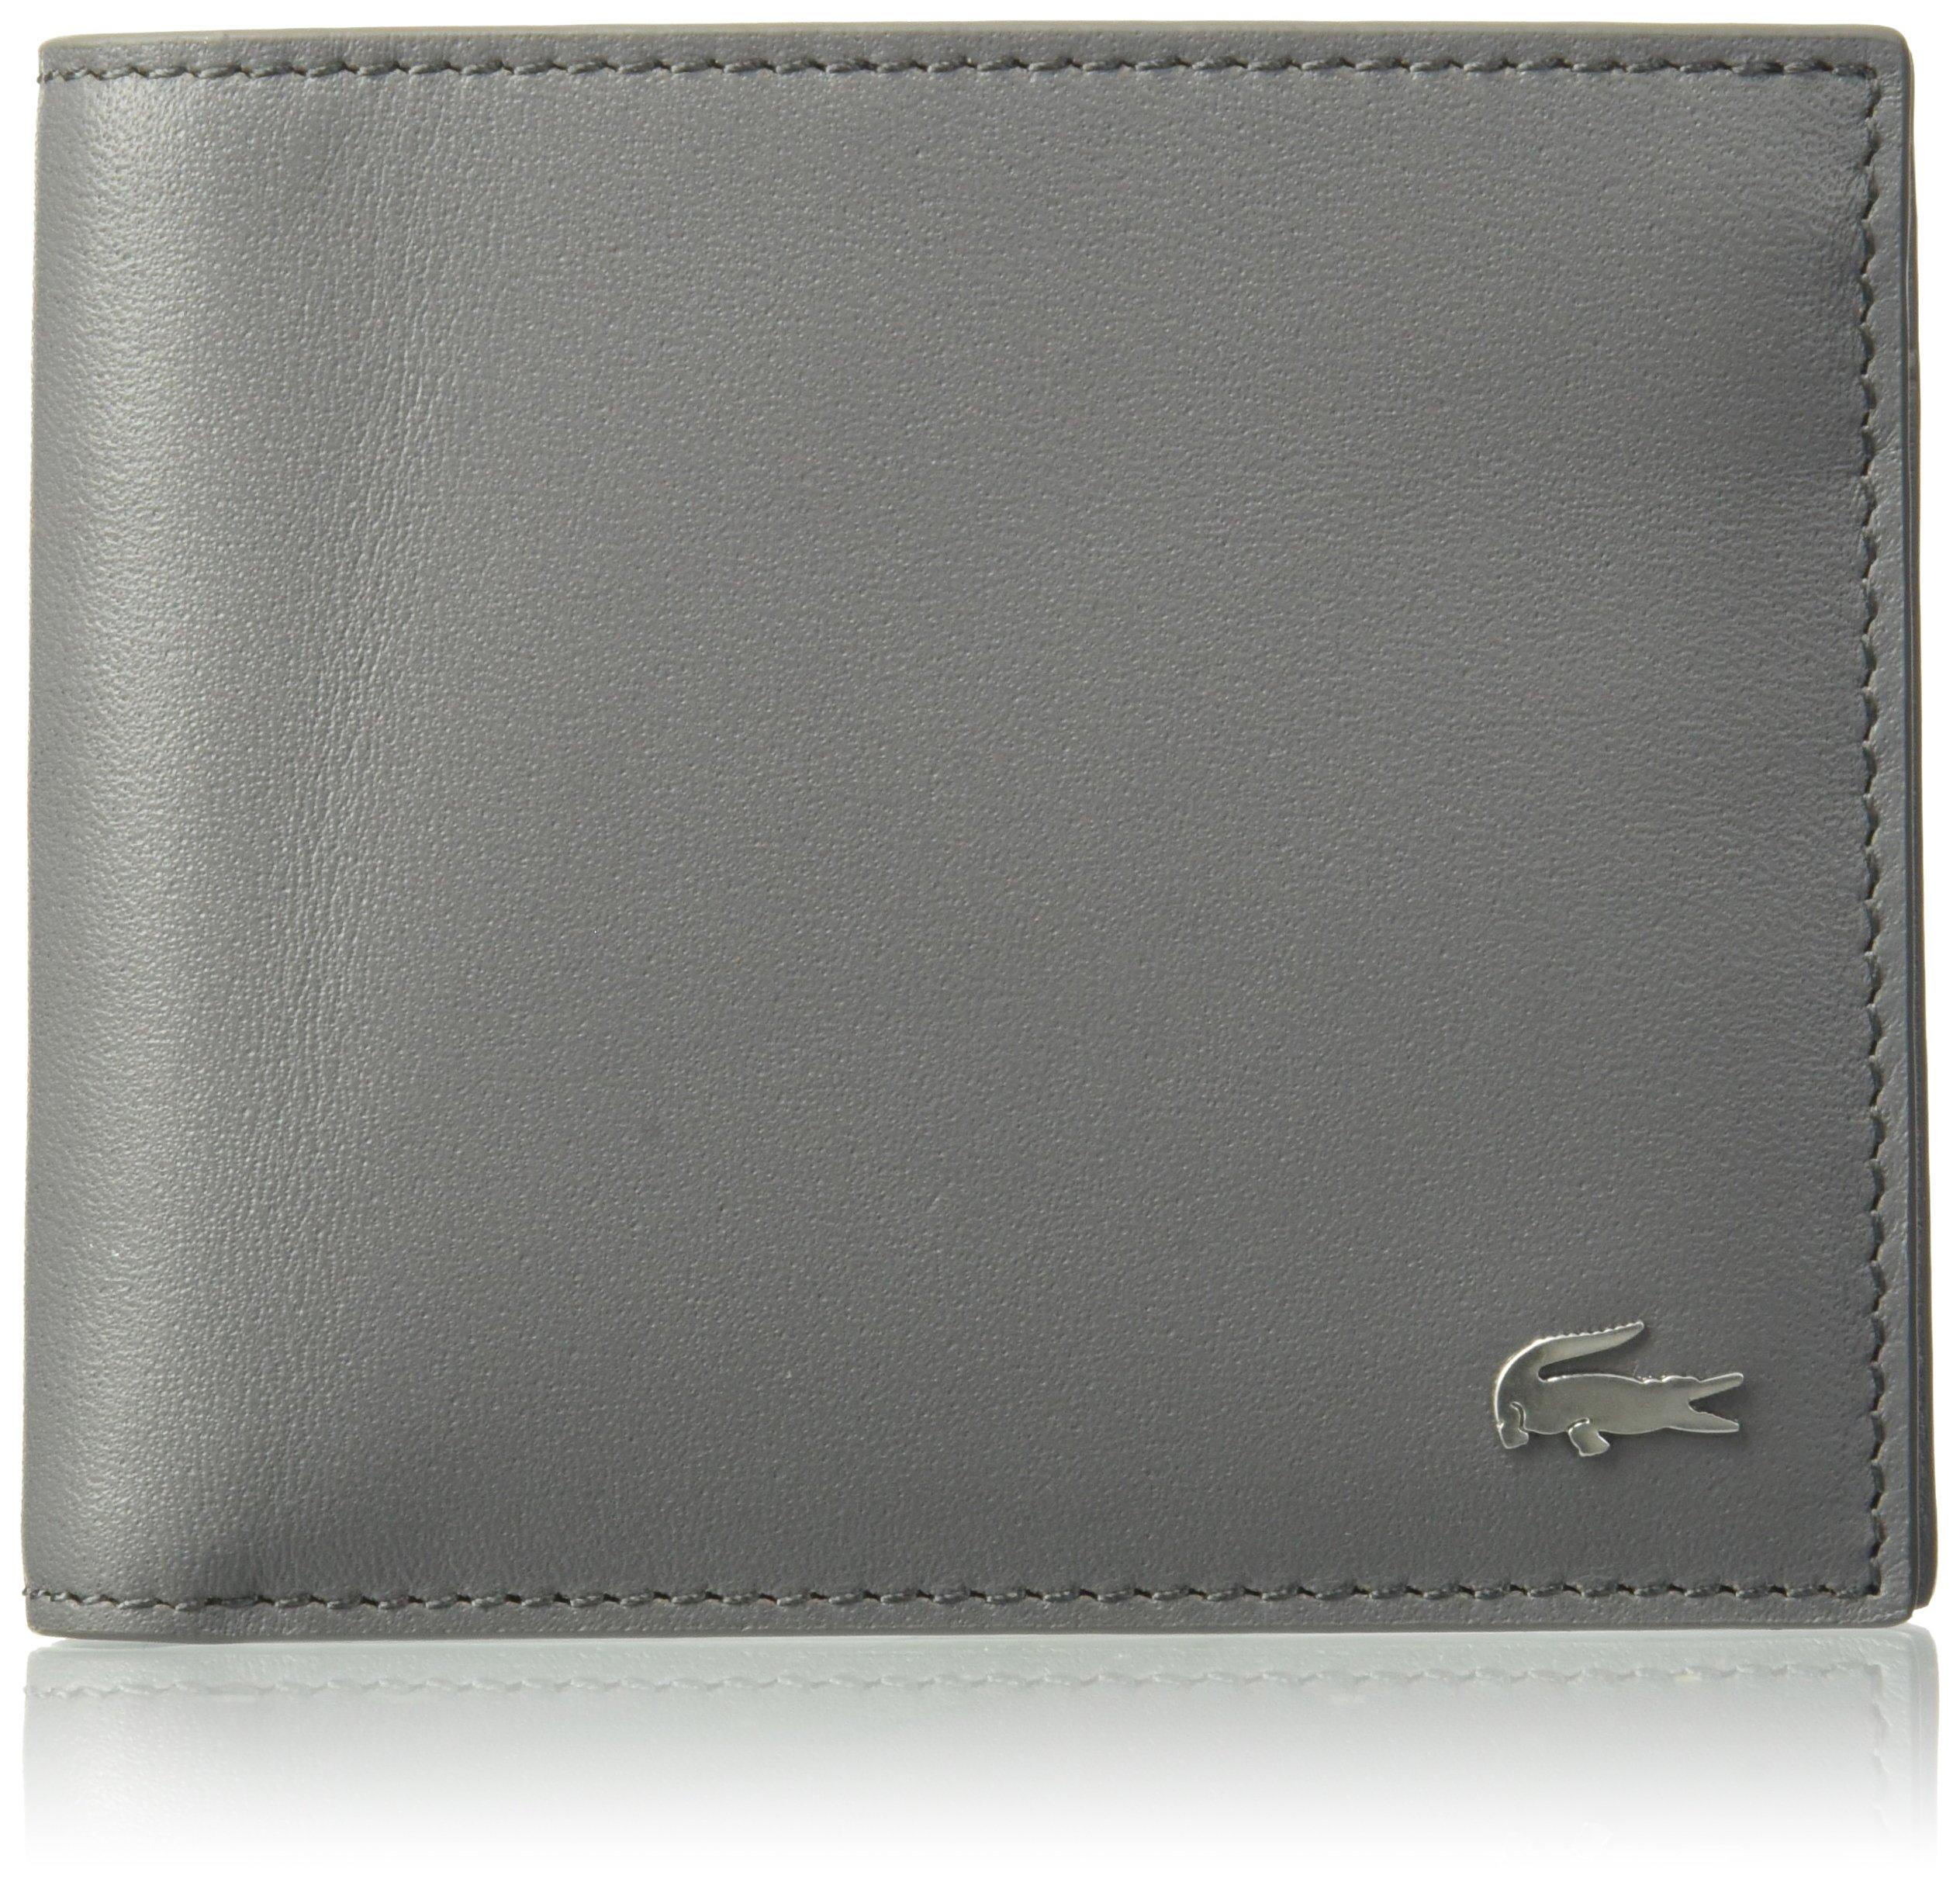 1e2c60fe Galleon - Lacoste Men's Fg Large Billfold & Coin Wallet